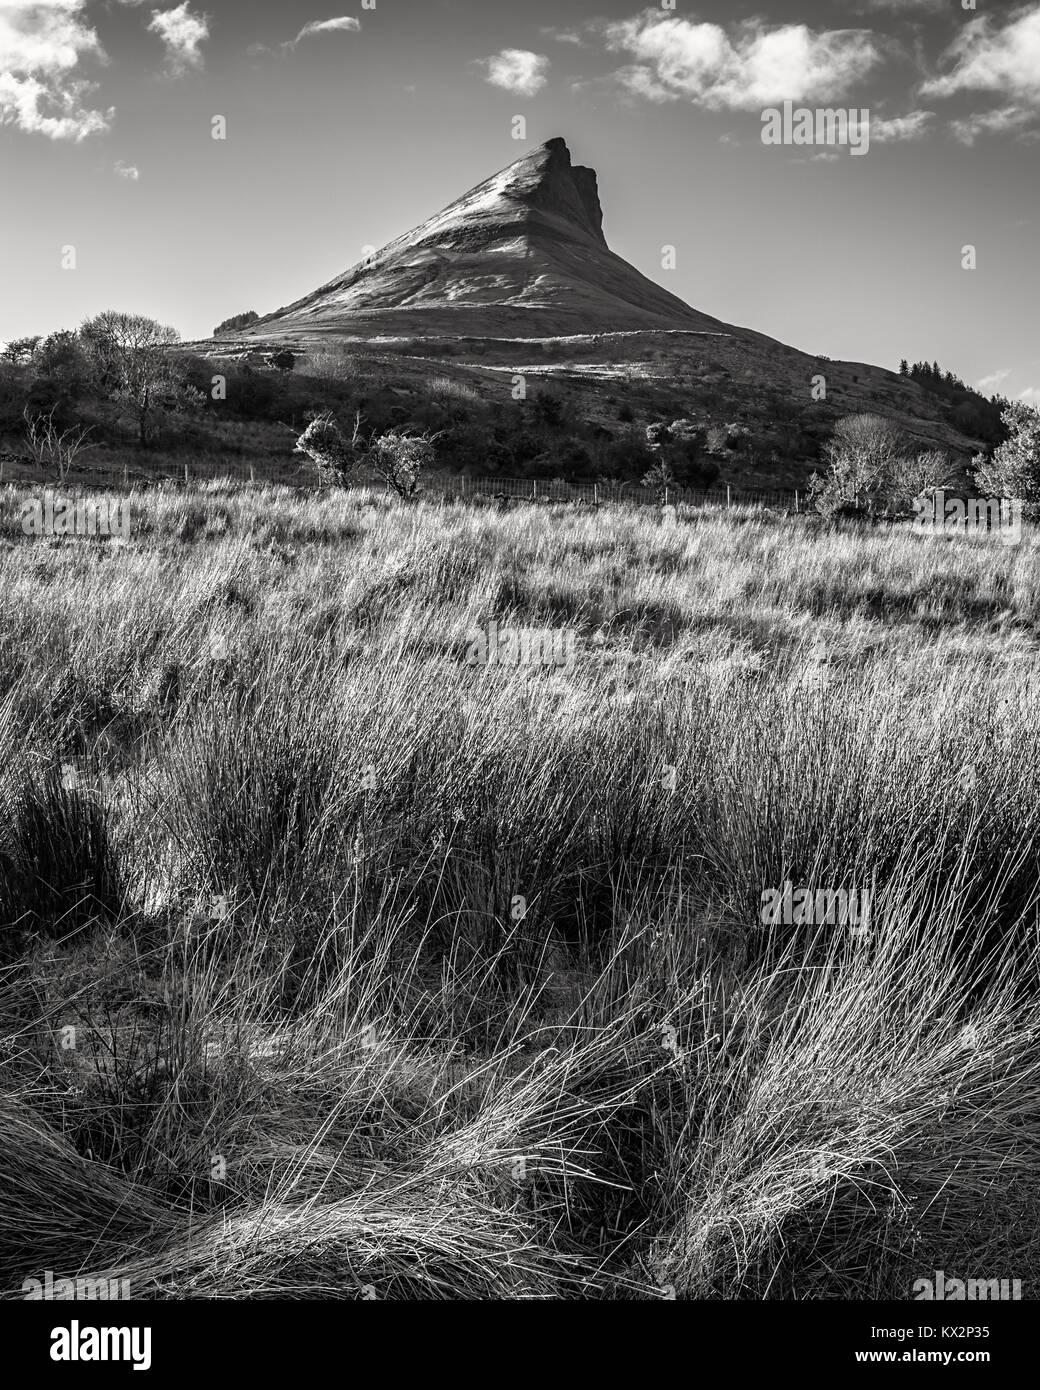 Benwiskin mountain in Sligo - Ireland - Stock Image